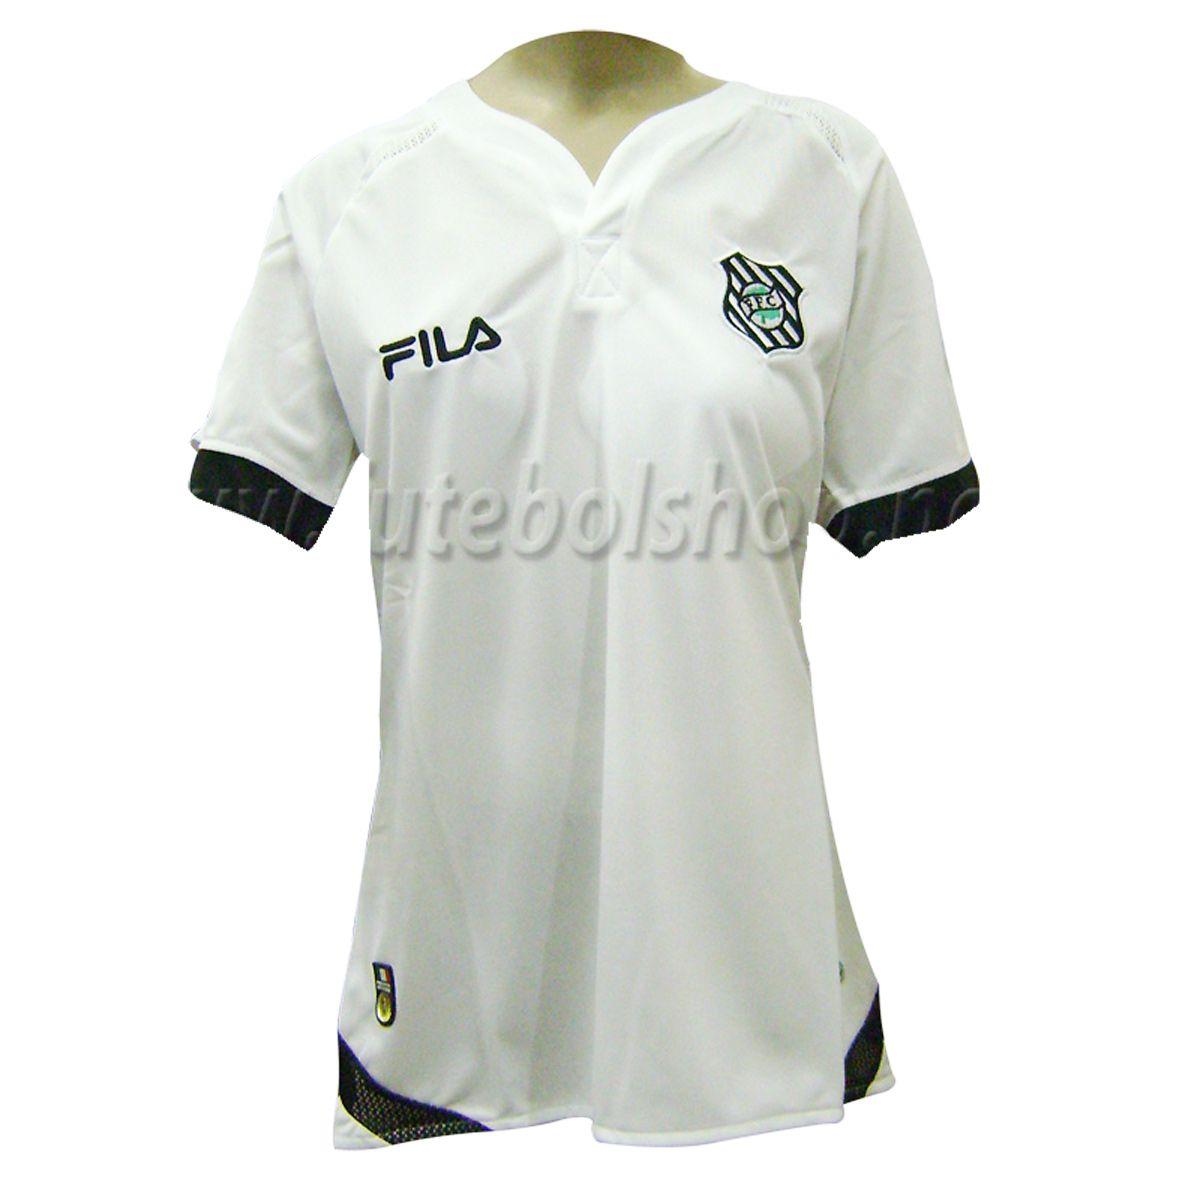 Camisa do Figueirense Feminina 2010 - 354881